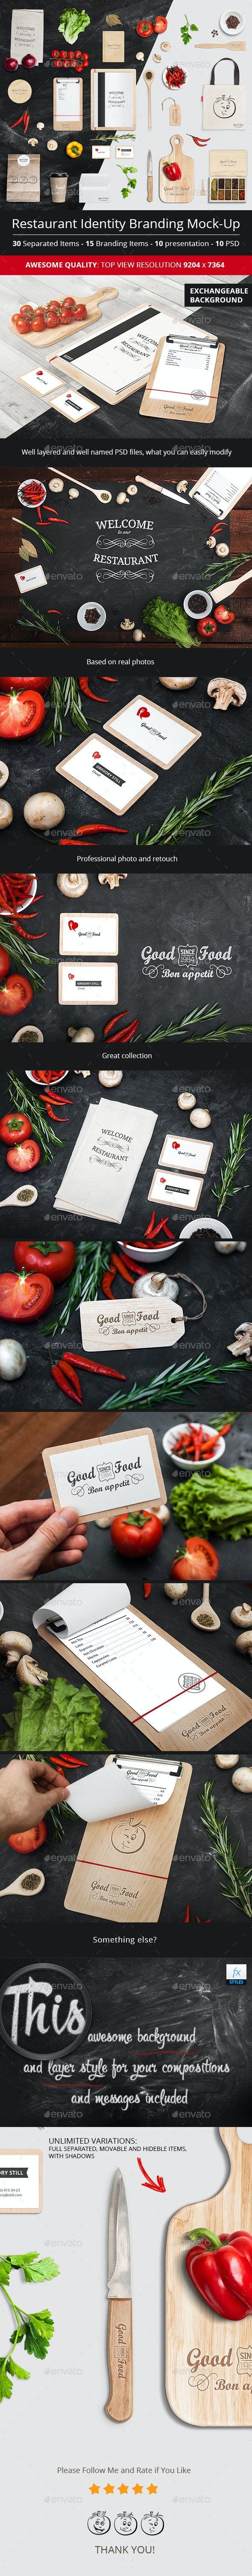 Restaurant Identity Branding Mock-Up - Miscellaneous Product Mock-Ups